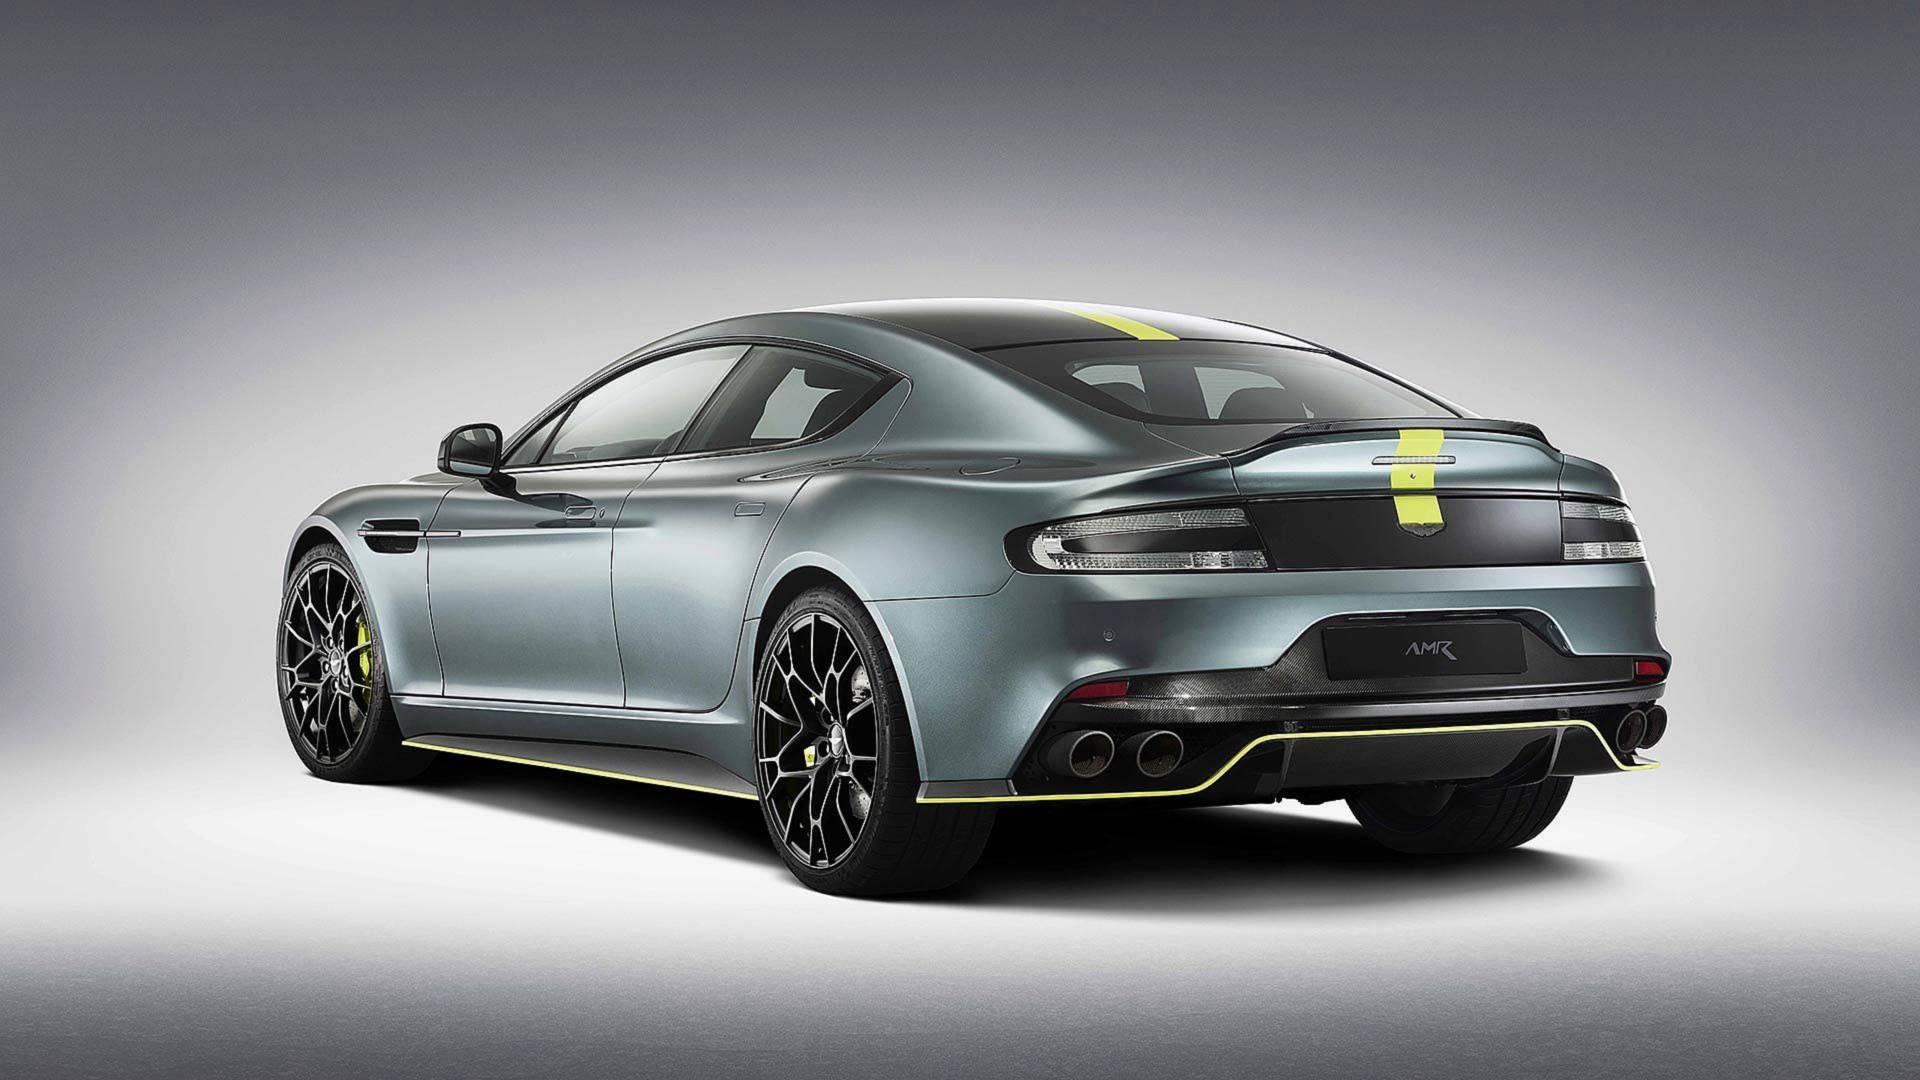 Aston Martin pridal Å¡tipku korenia aj Å¡tvordverovému Rapide